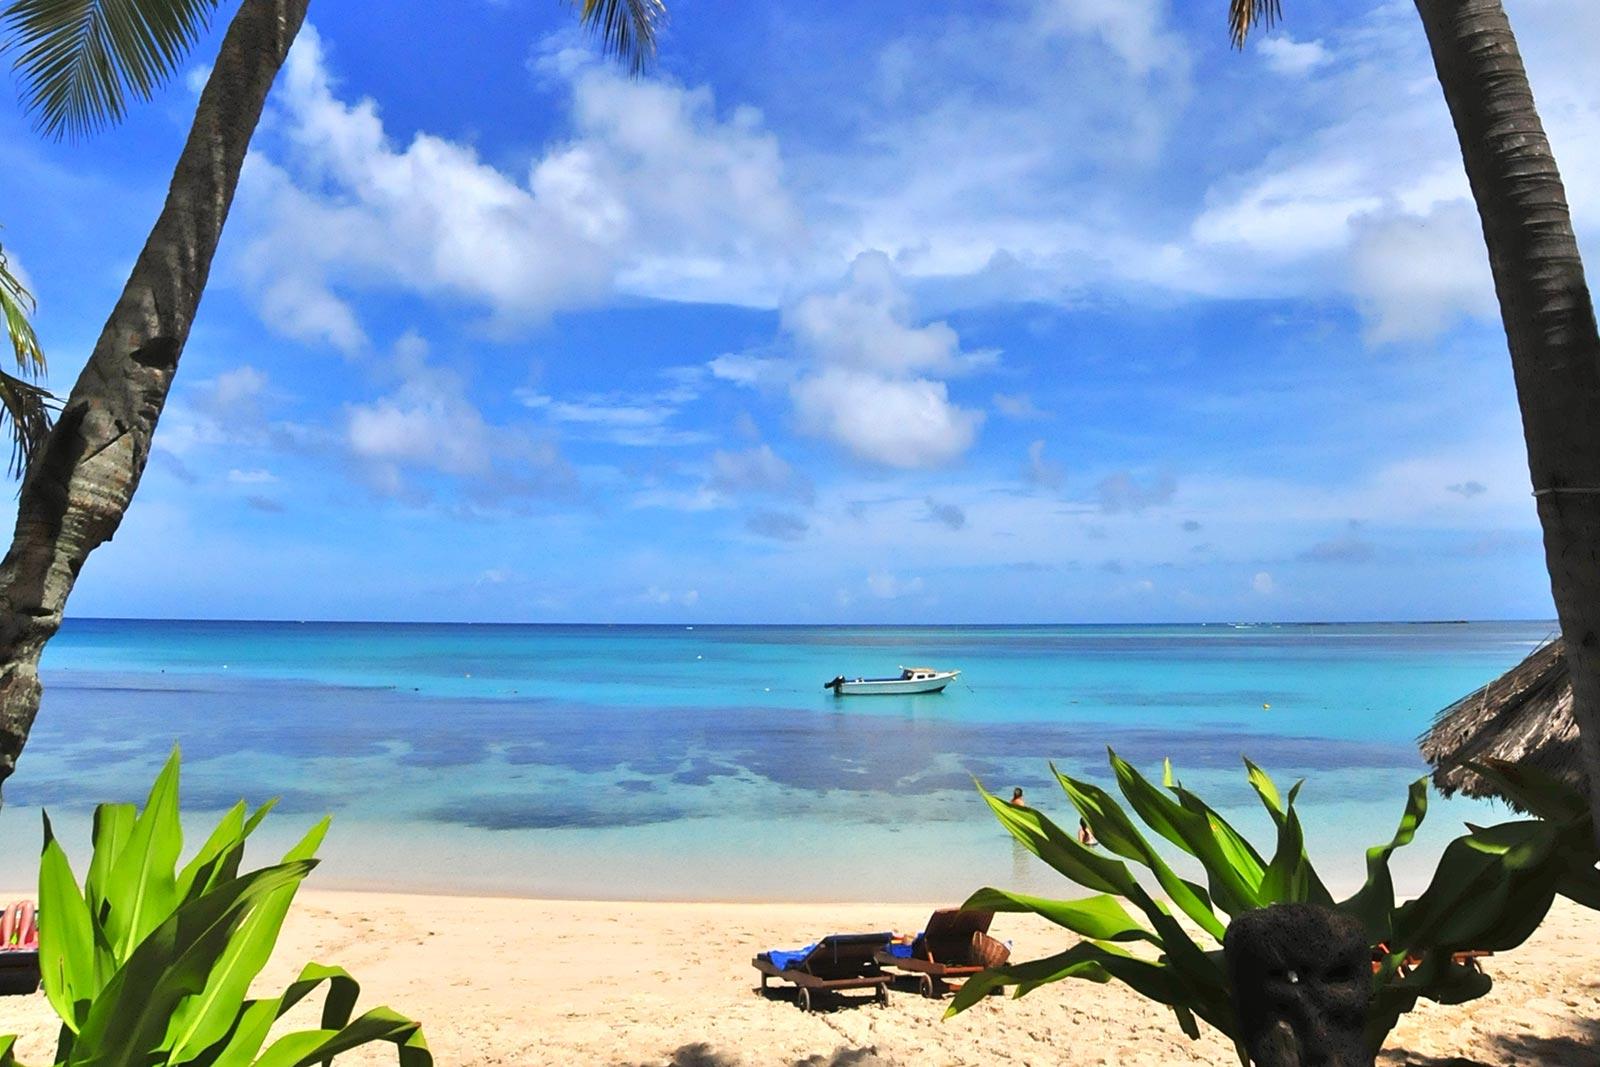 blue lagoon beach resort island travel network. Black Bedroom Furniture Sets. Home Design Ideas